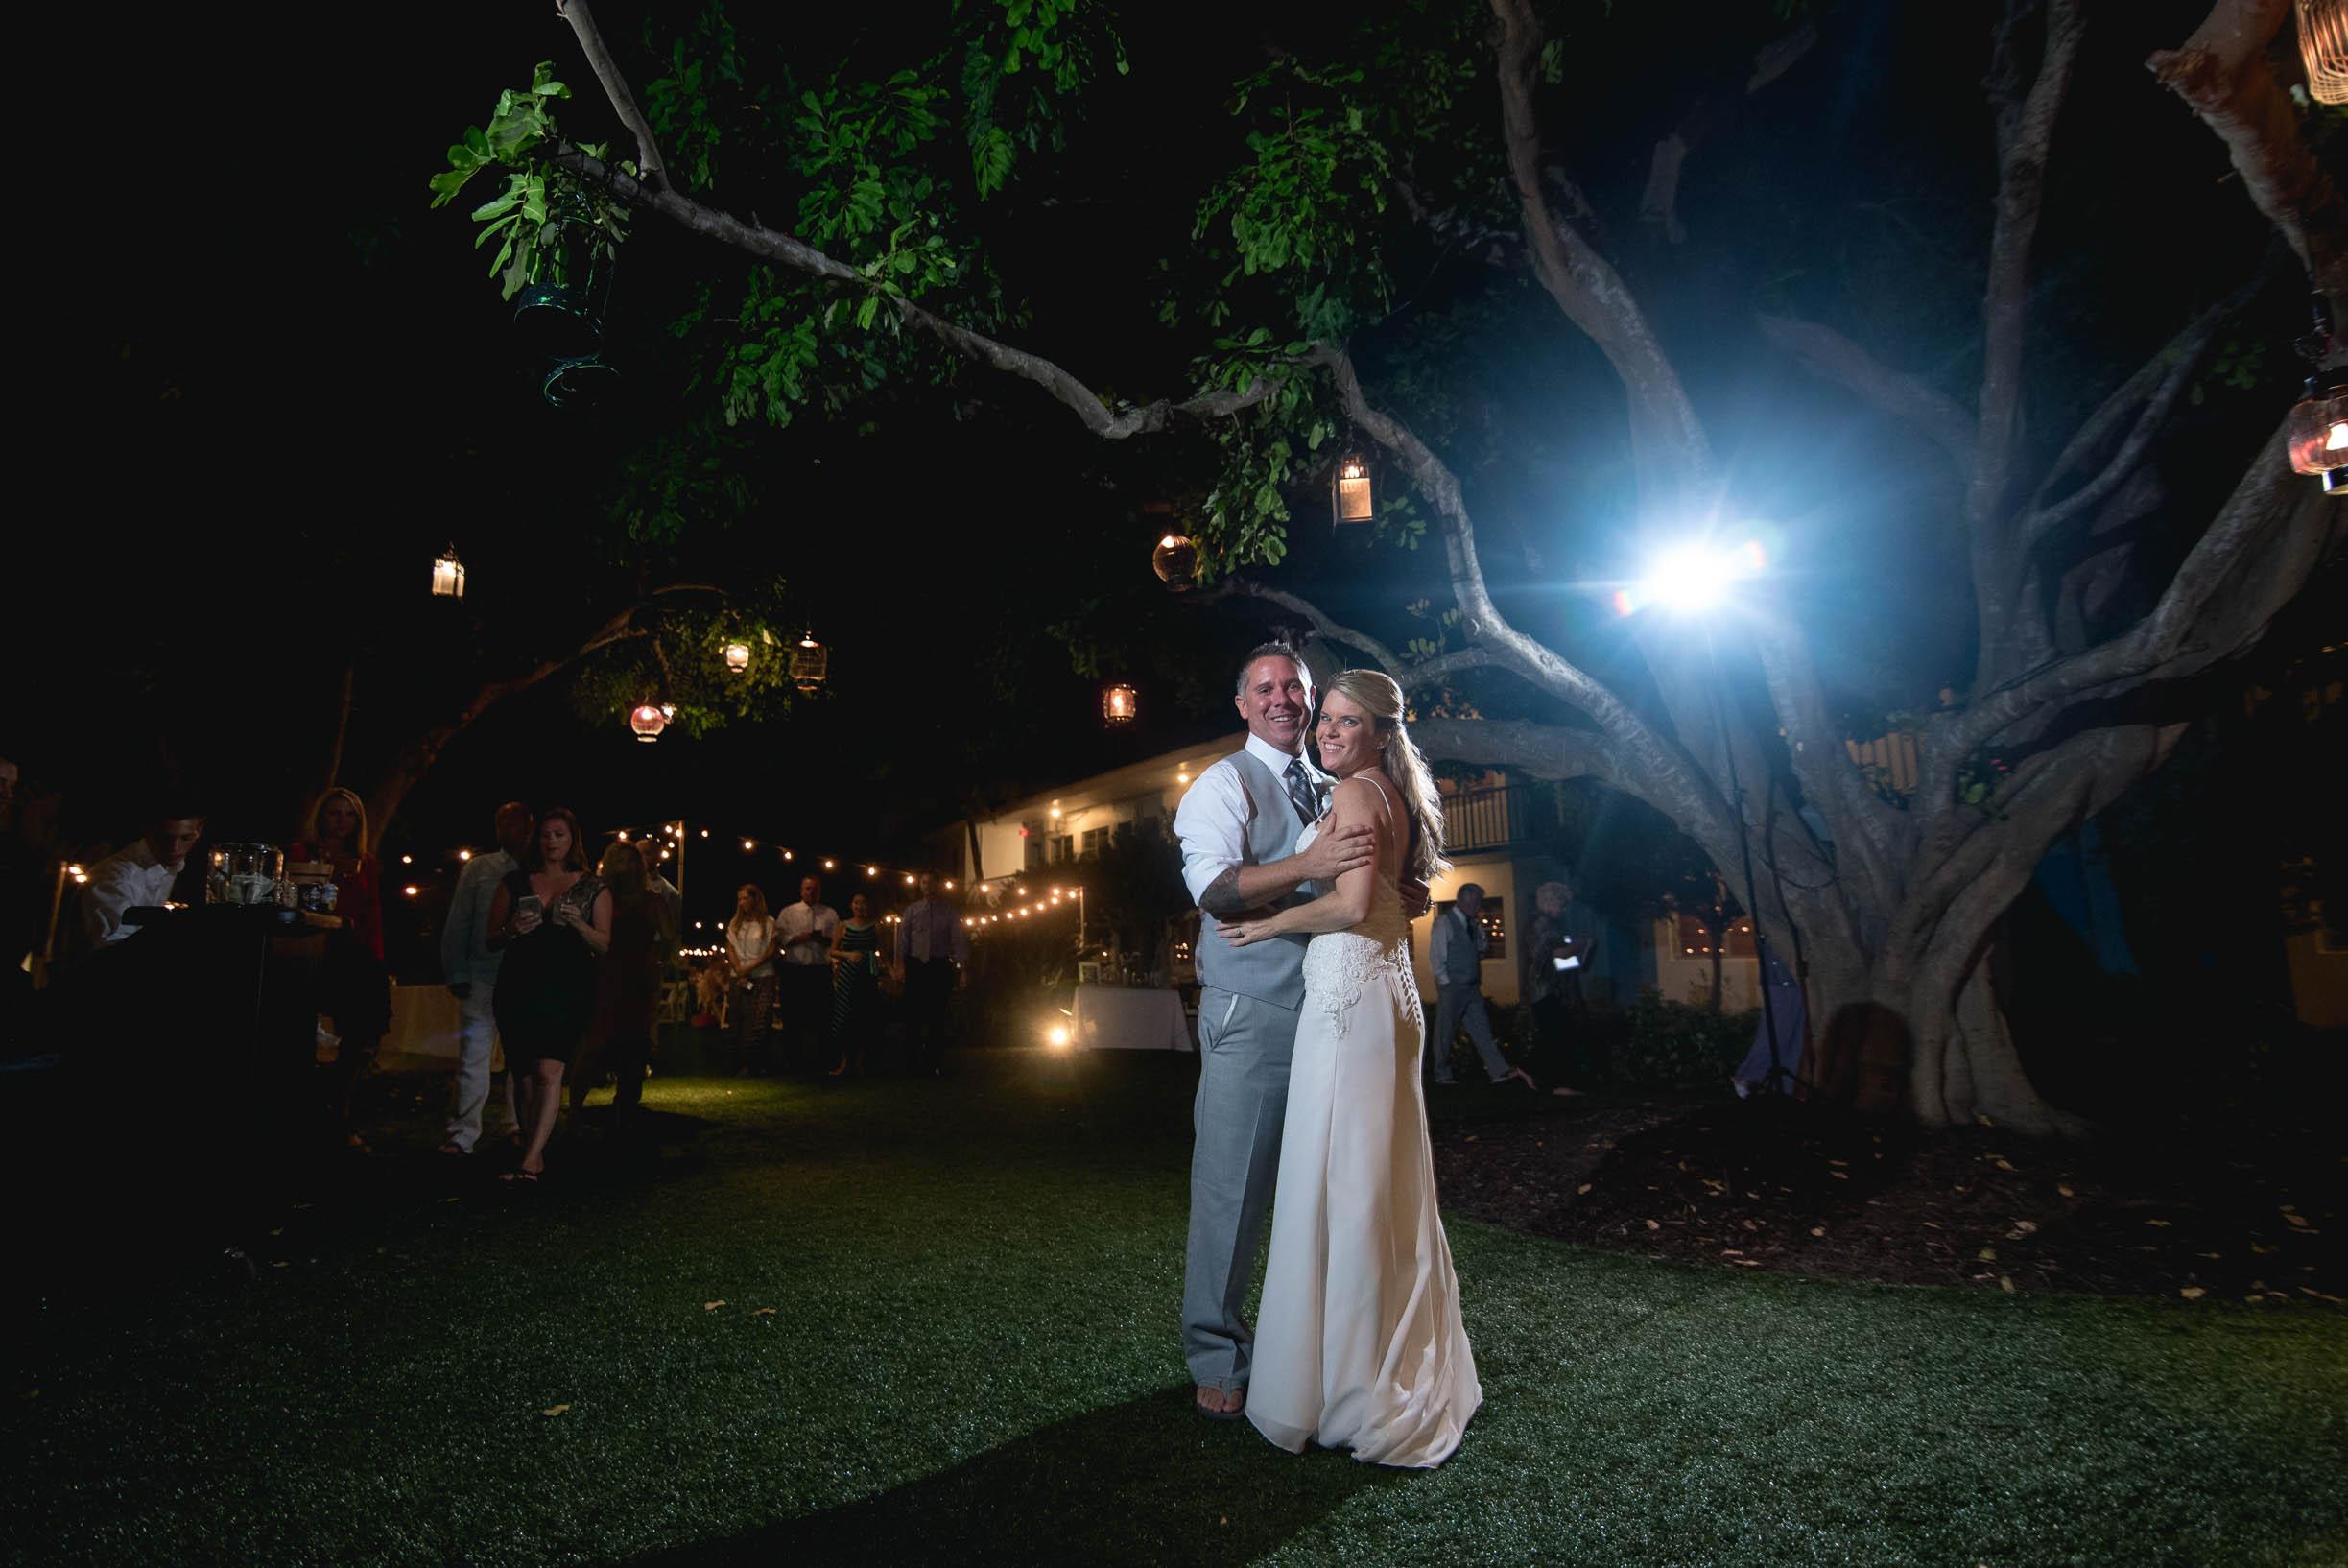 065Portland Wedding Photographer timothy capp.jpg